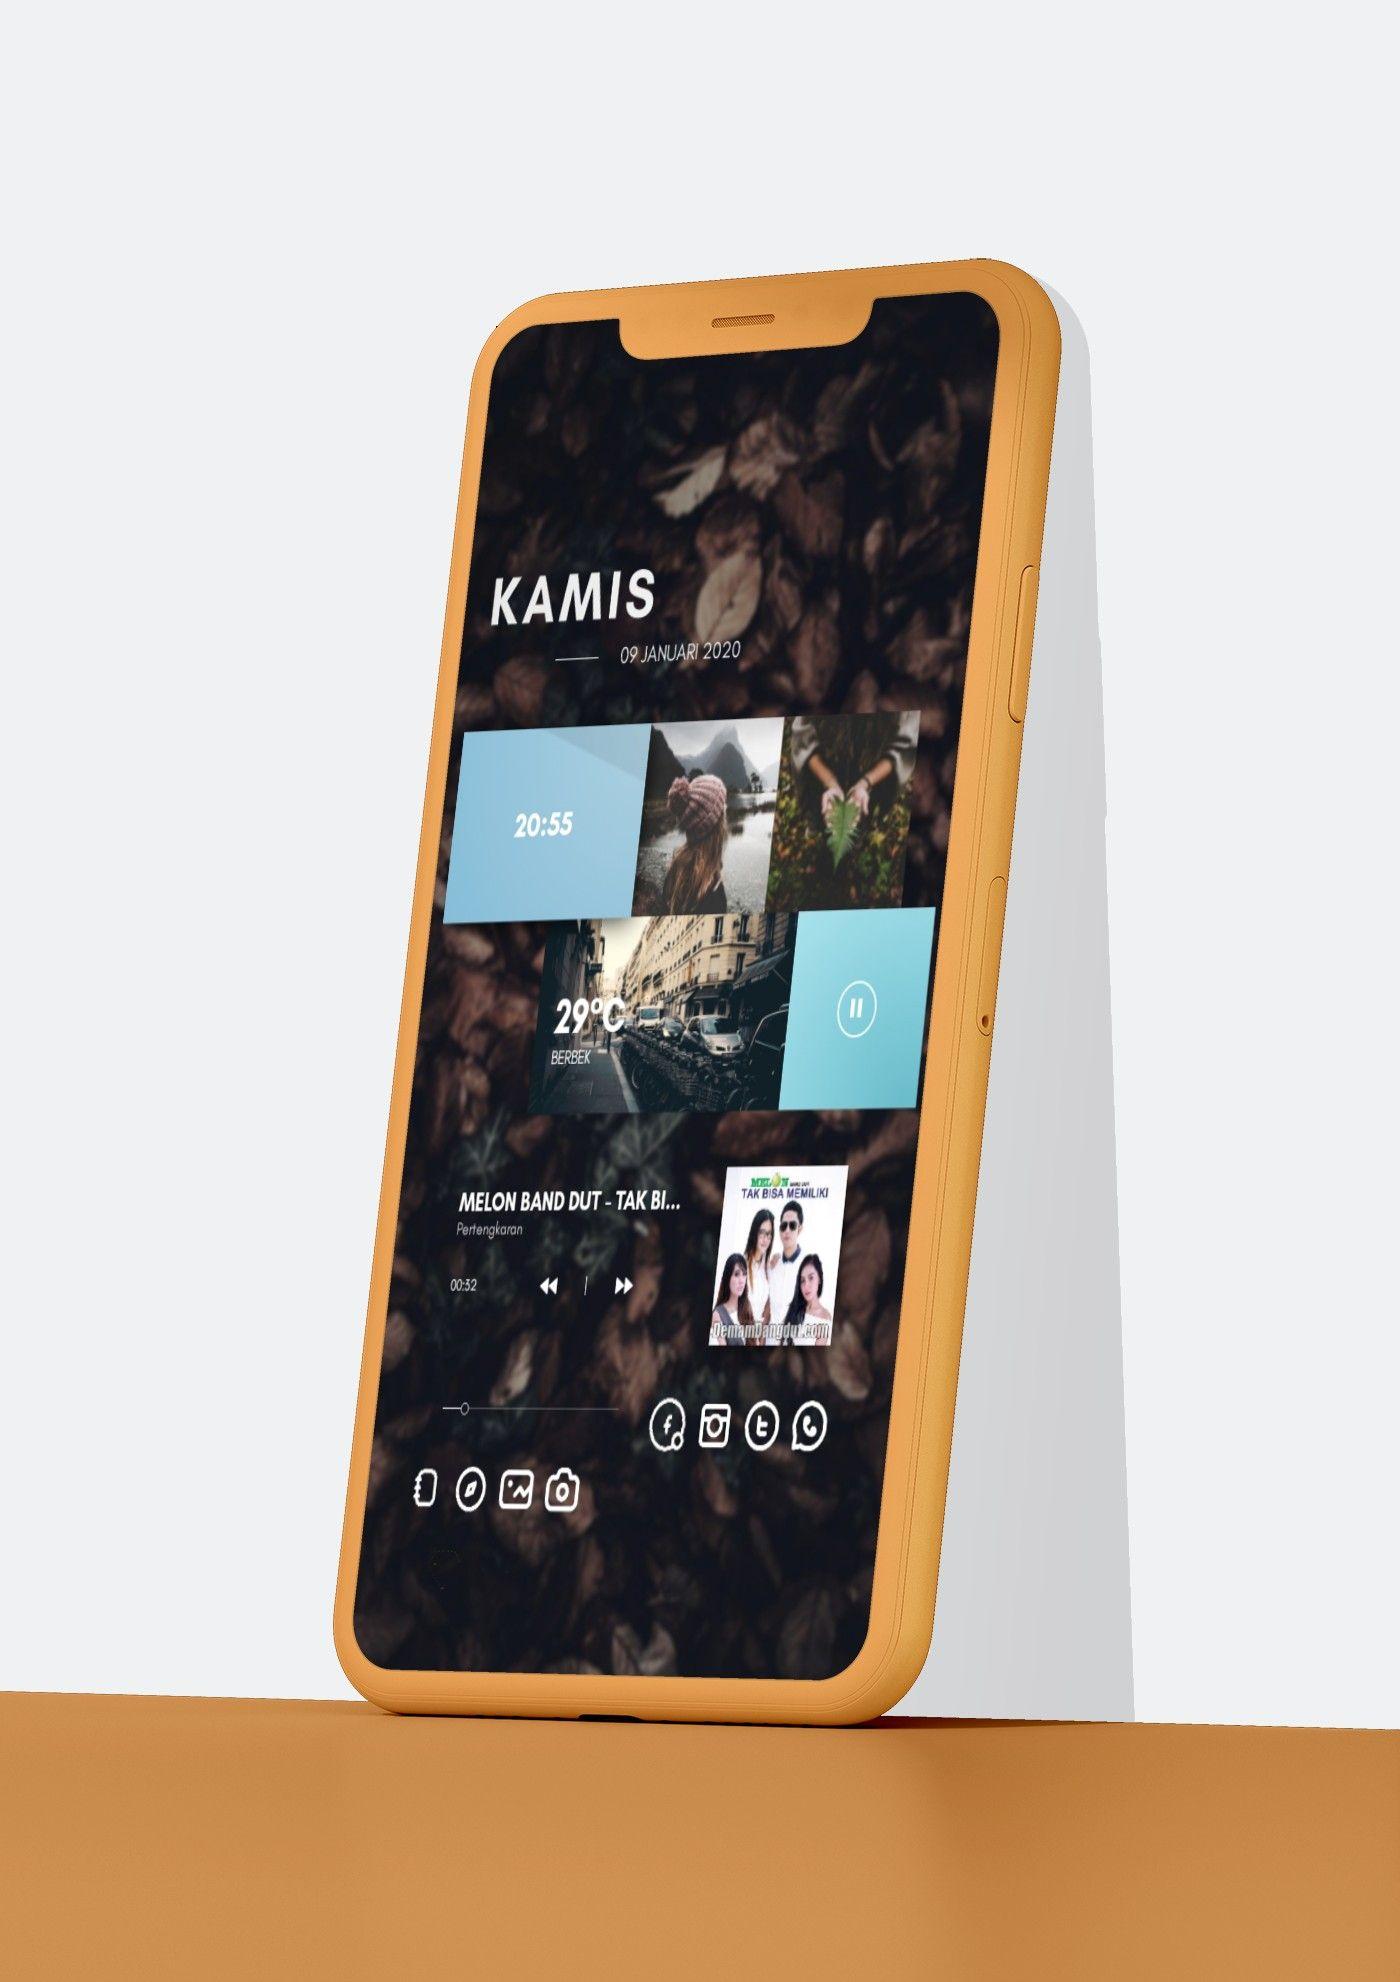 Best Nova launcher in 2020 Nova launcher, Homescreen, Iphone